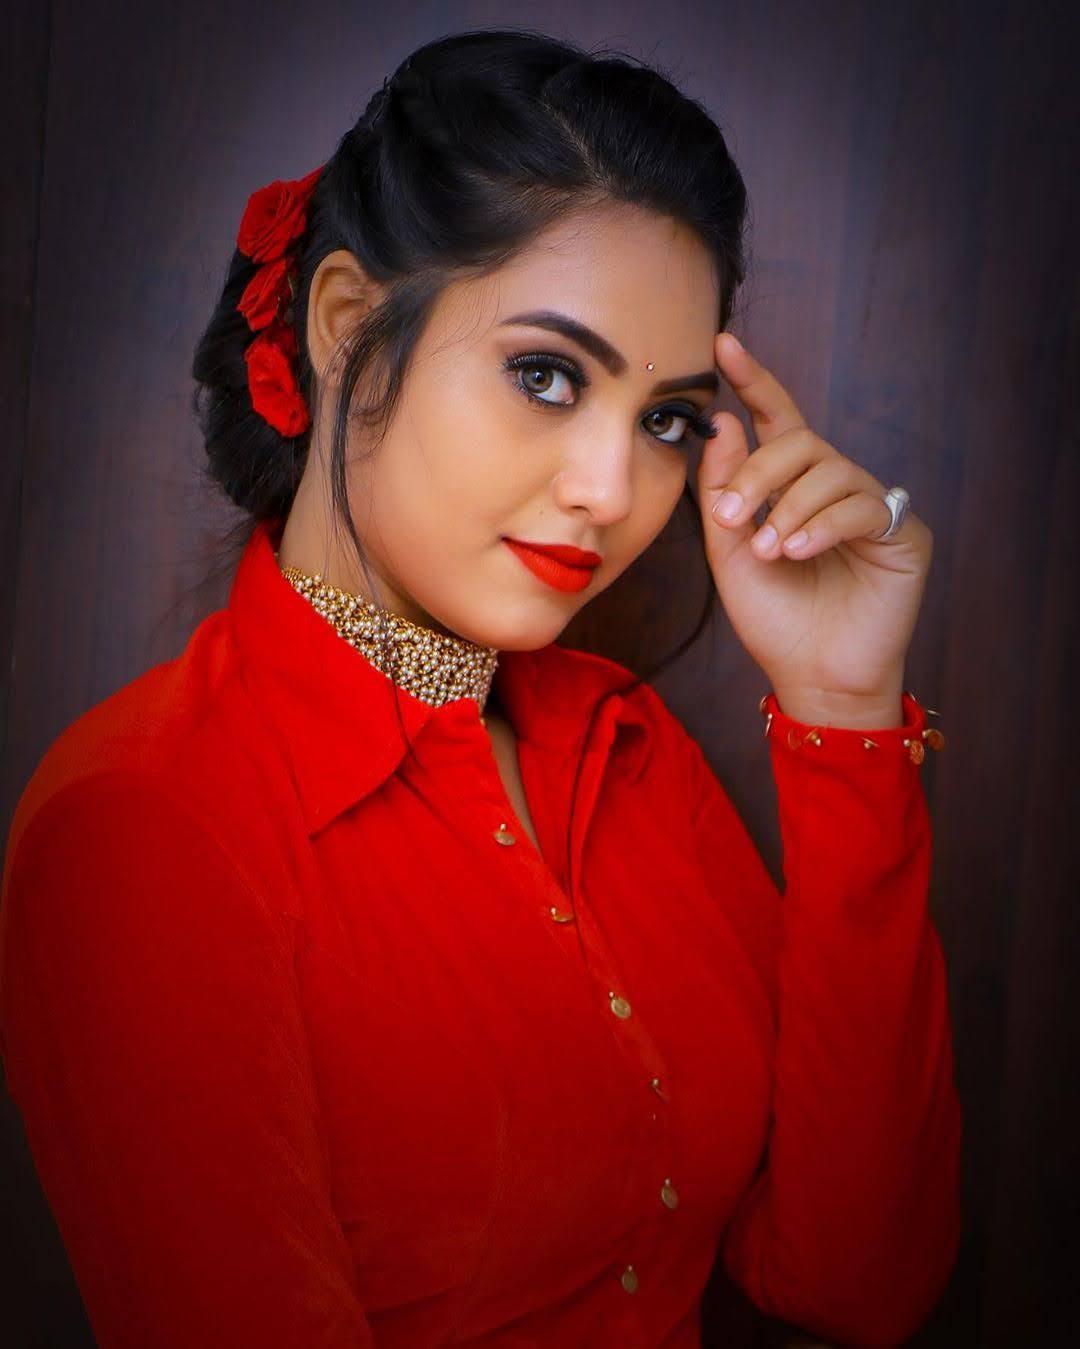 pavithra-janani-64643